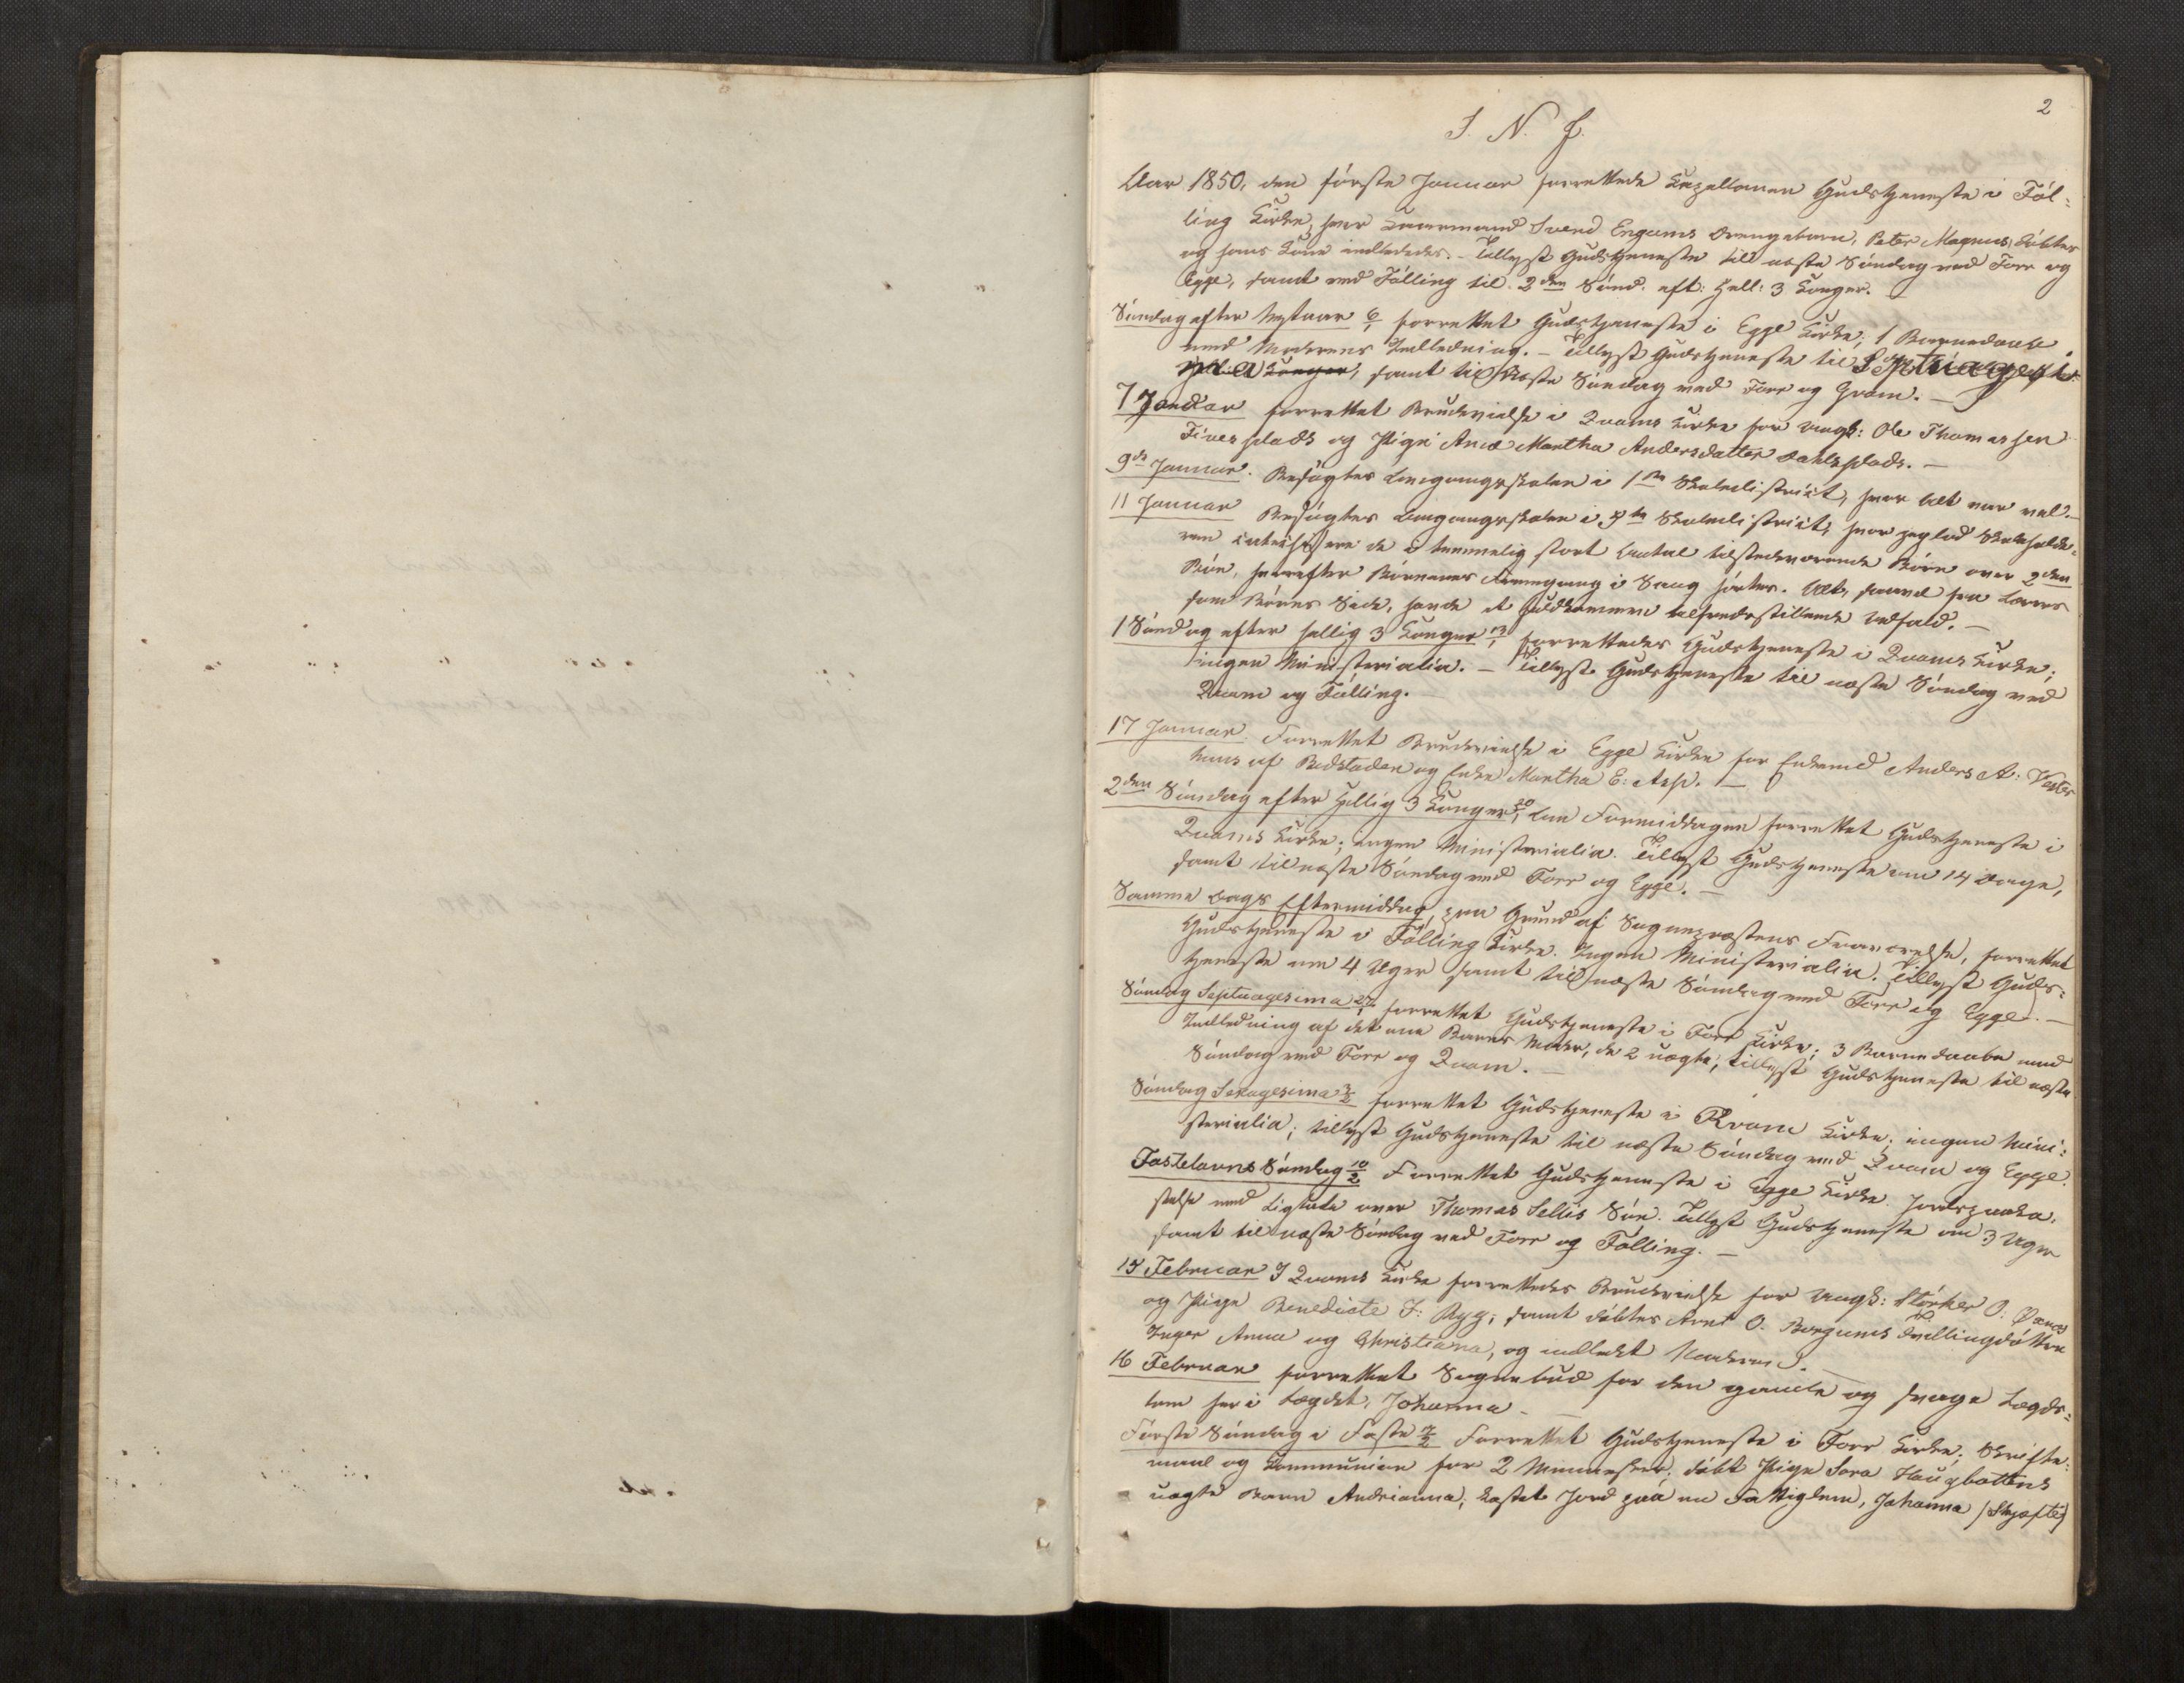 SAT, Stod sokneprestkontor, I/I1/I1d/L0002: Curate's parish register no. 2, 1850-1869, p. 2